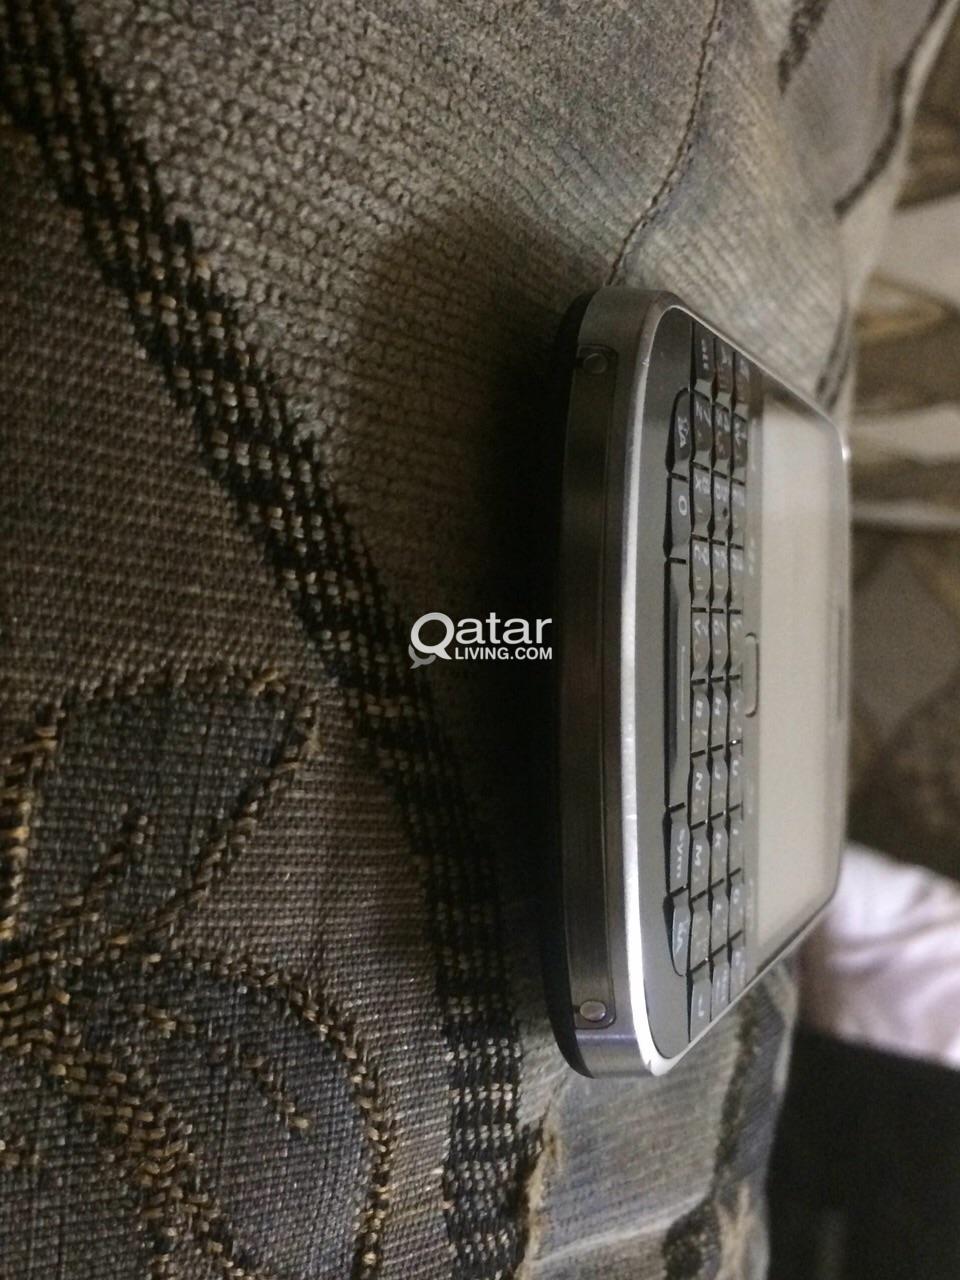 Blackberry Bold 9900 | Qatar Living